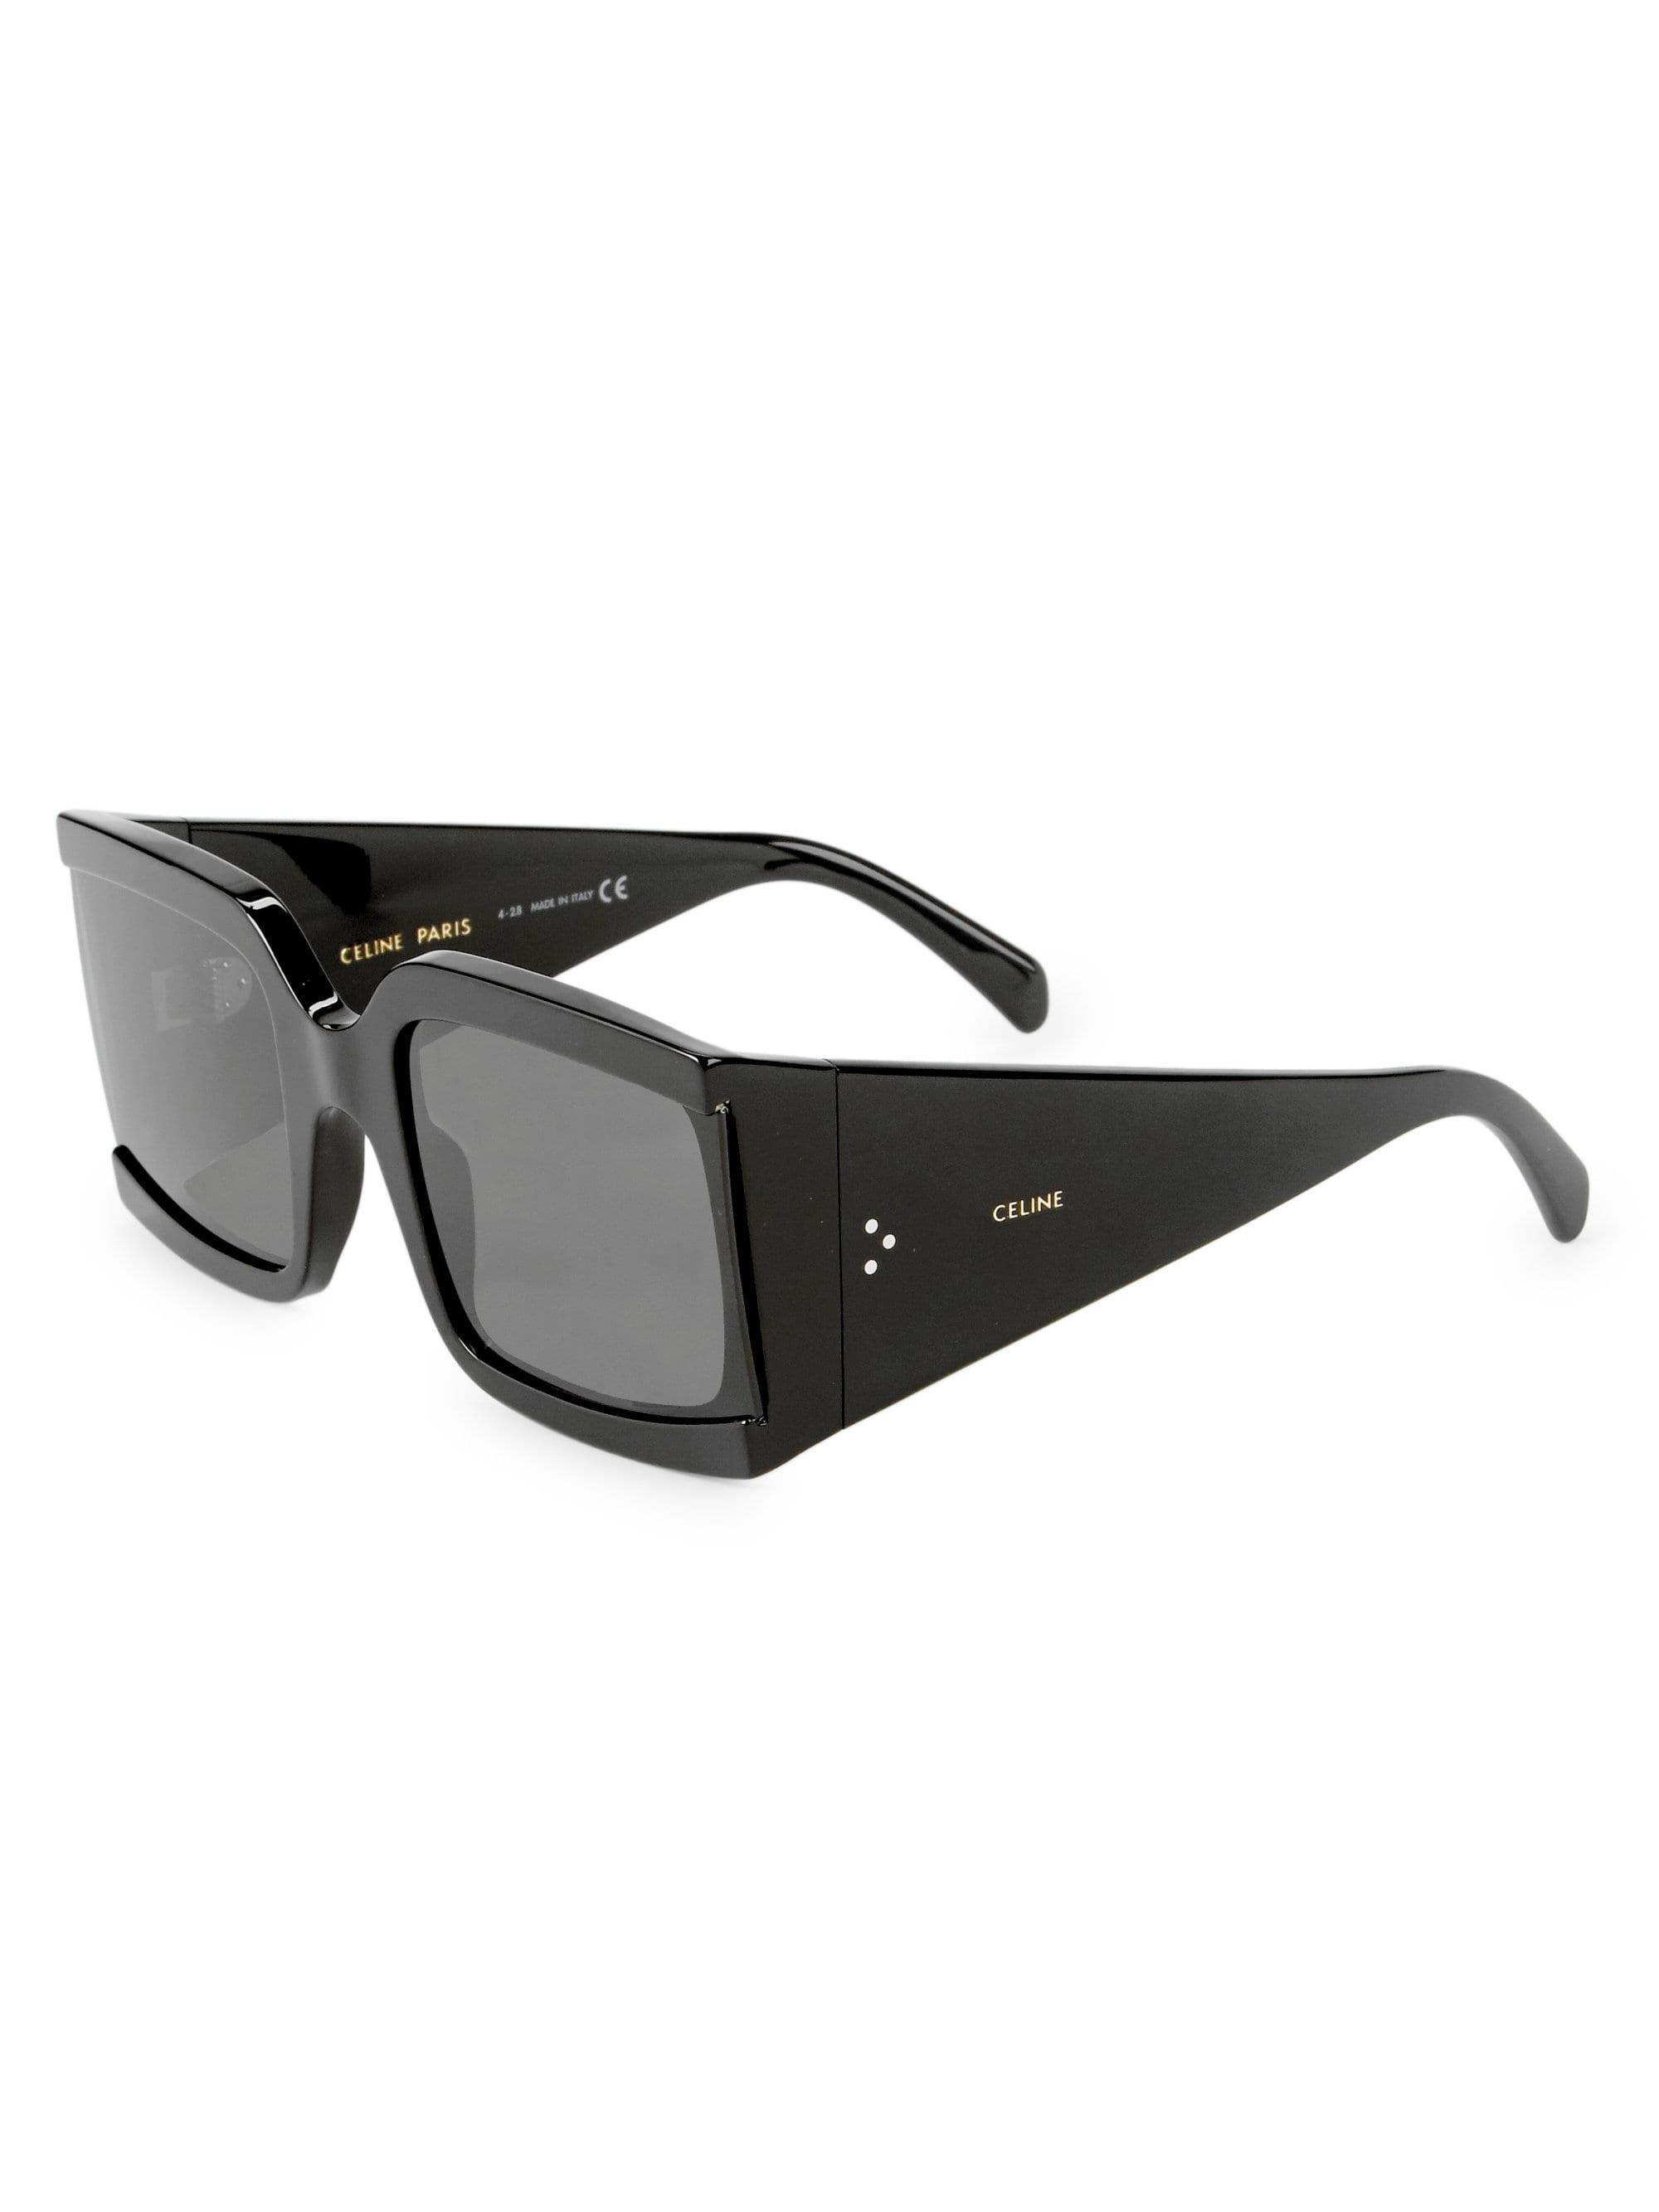 064136cf7d20 Céline - Black 60mm Square Sunglasses - Lyst. View fullscreen